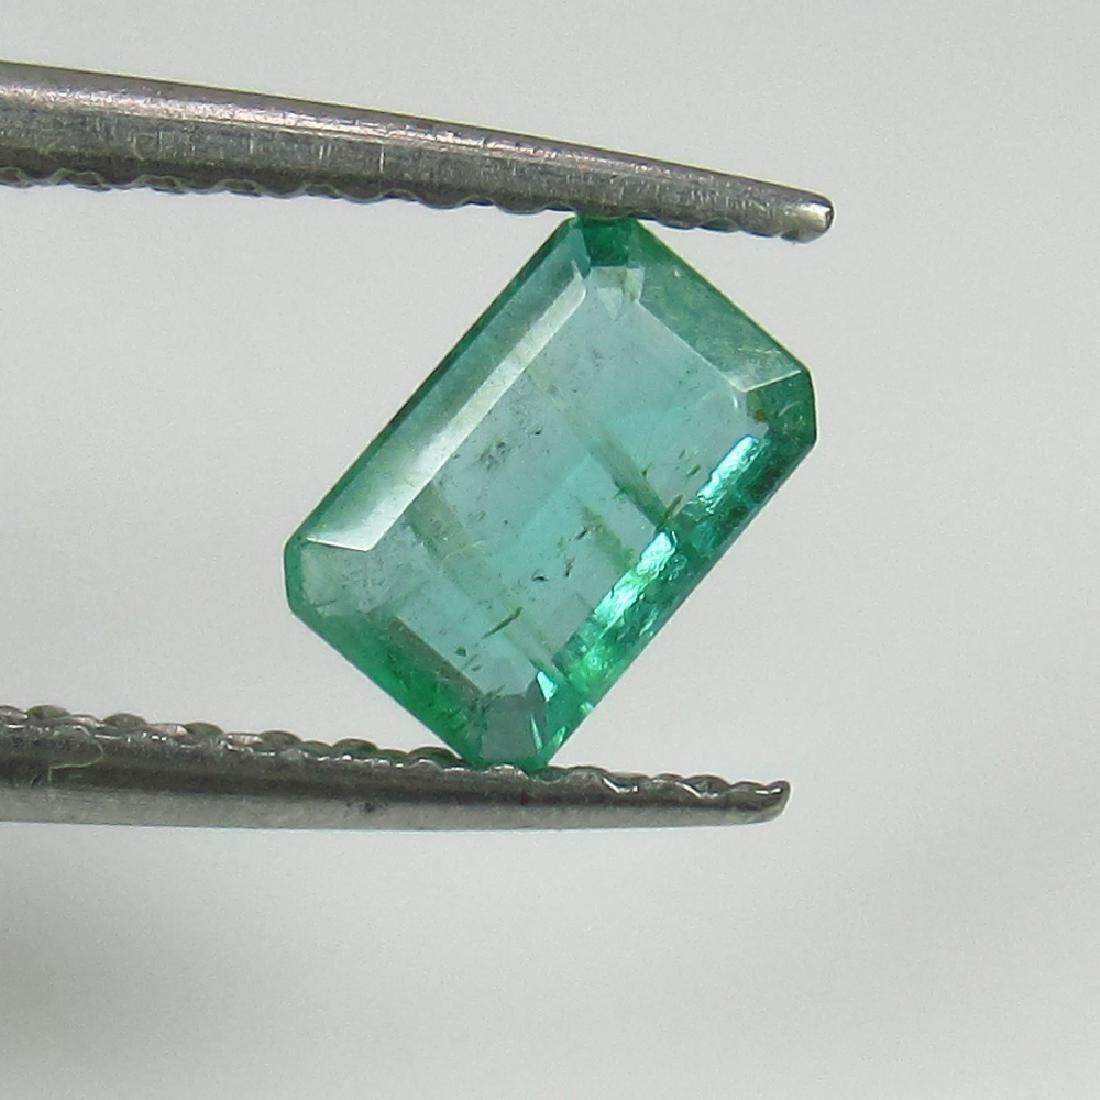 0.39 Ct Genuine Zambian Emerald 5.5X3.5 mm Octagon Cut